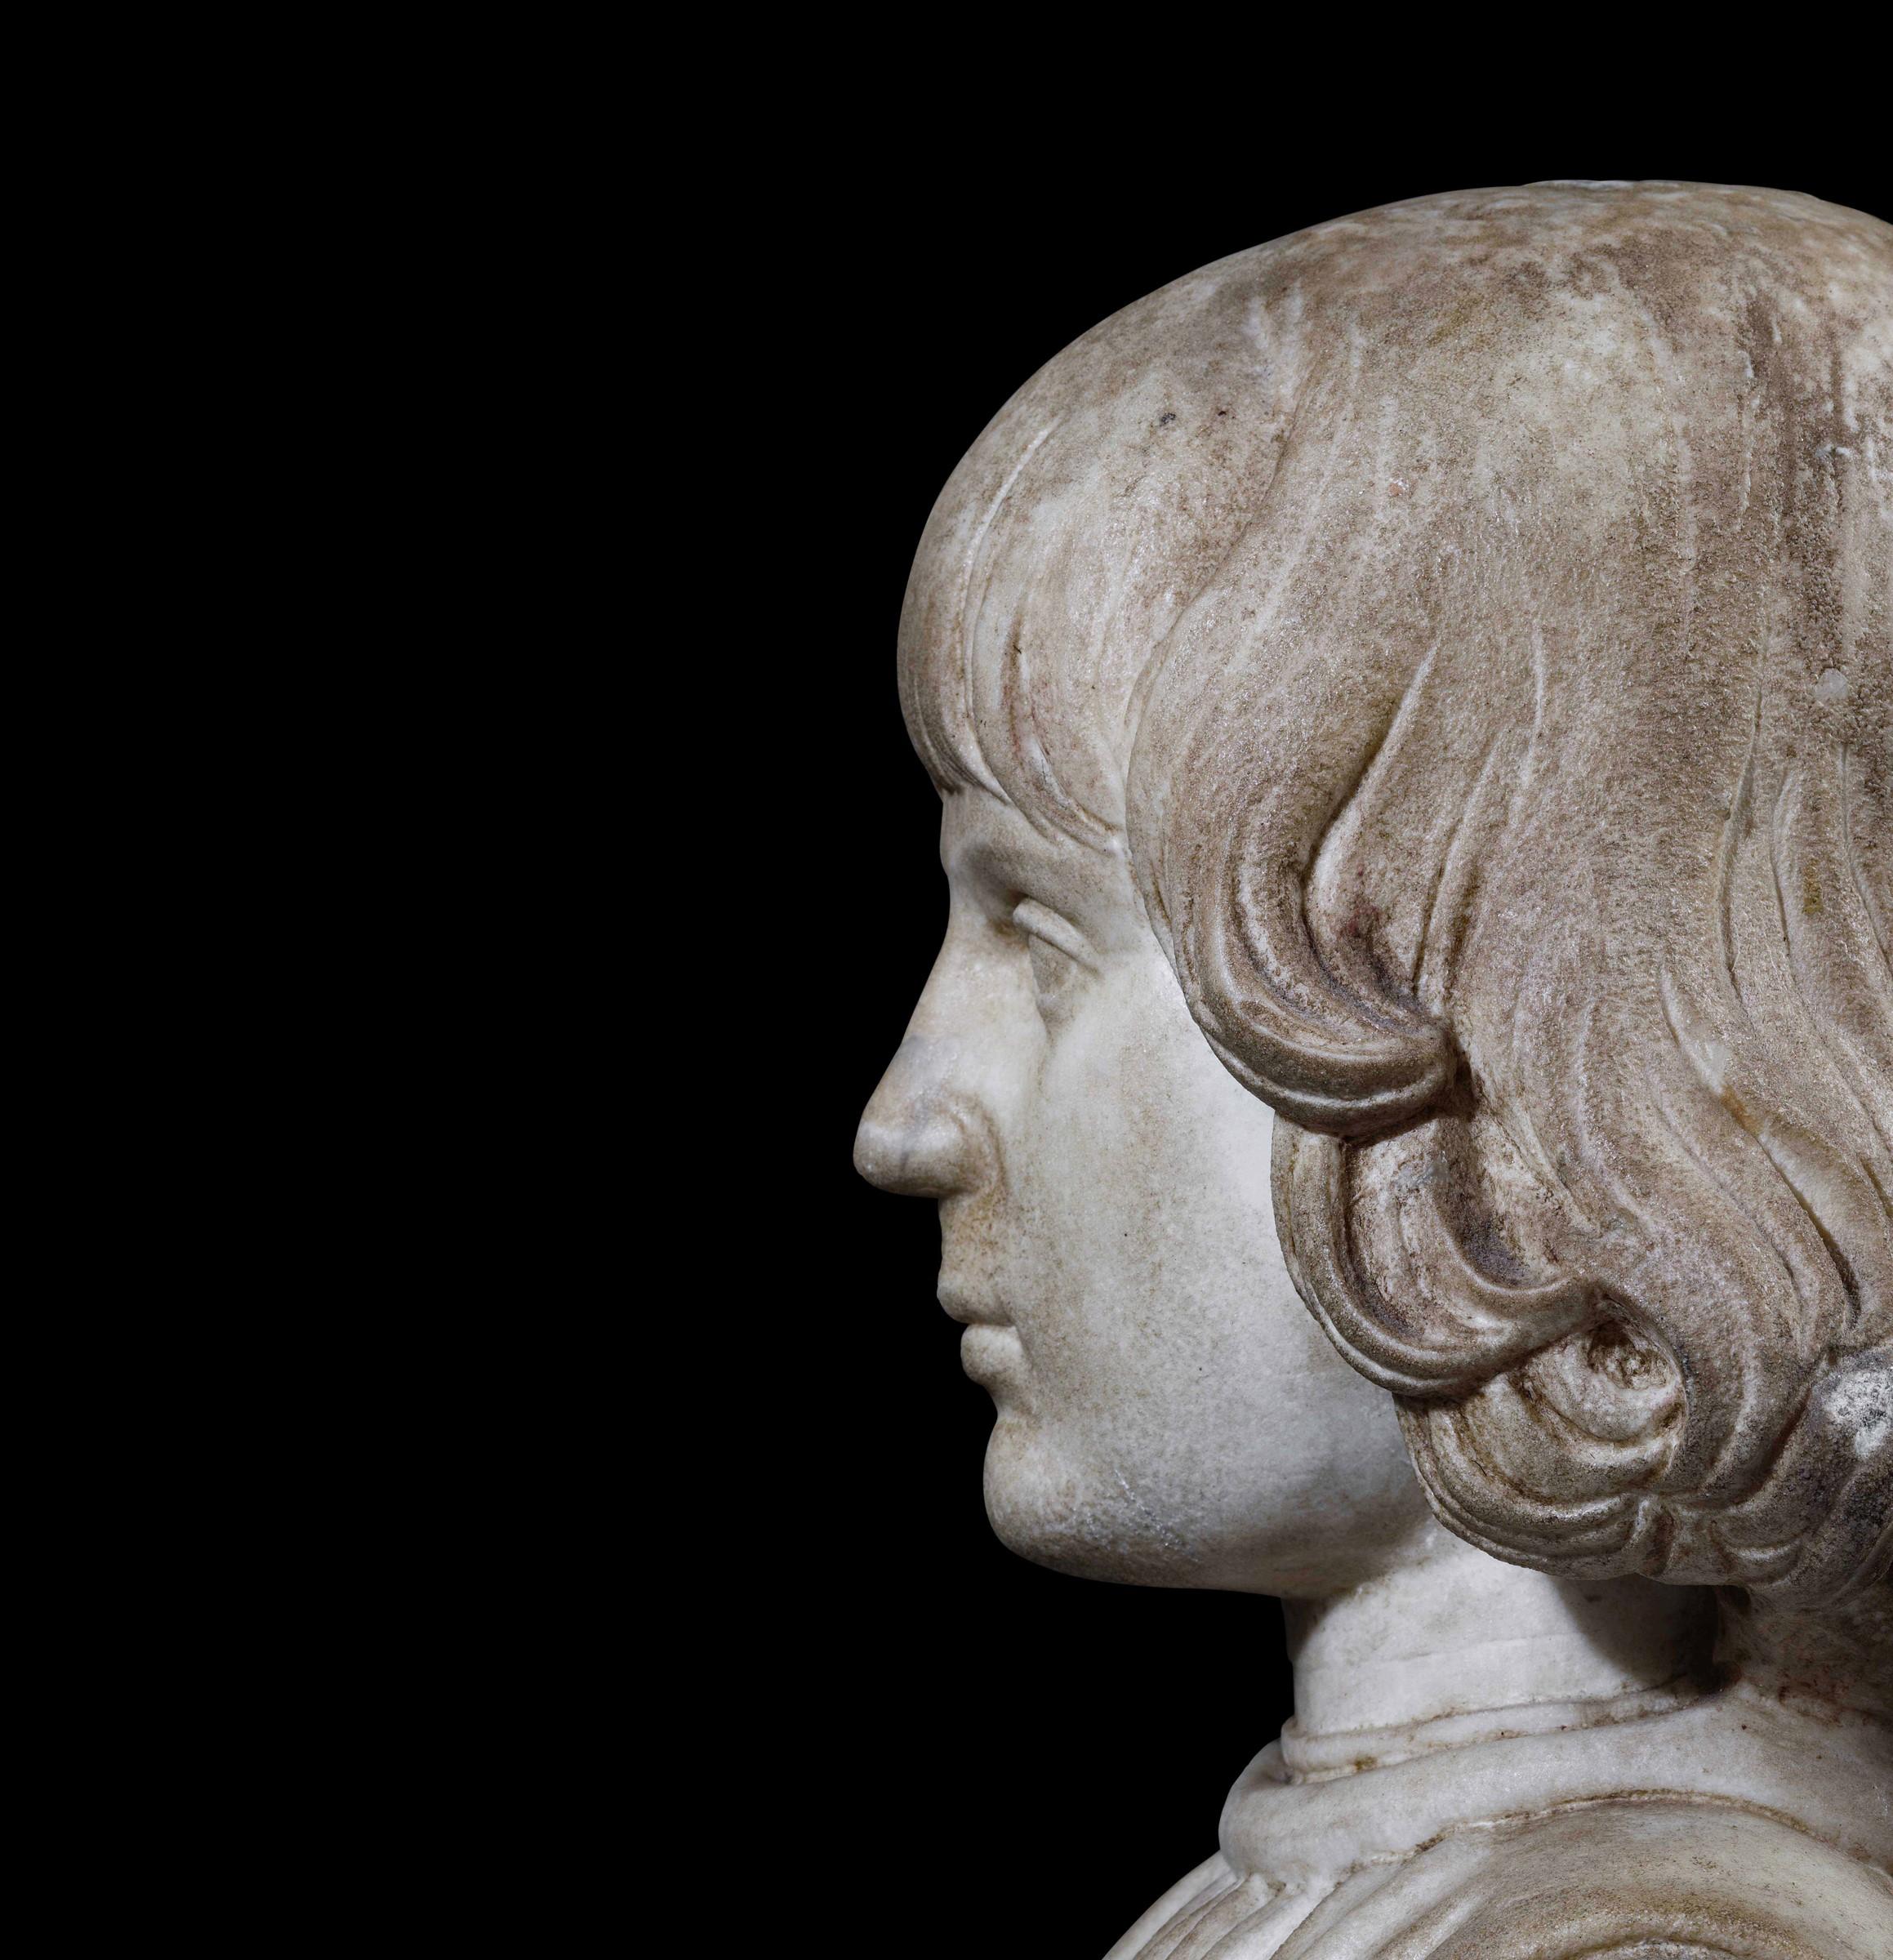 A marble bust, attr. F. Laurana, 1400s - cm 41x32x22. L'opera è accompagnata da una [...] - Image 4 of 4